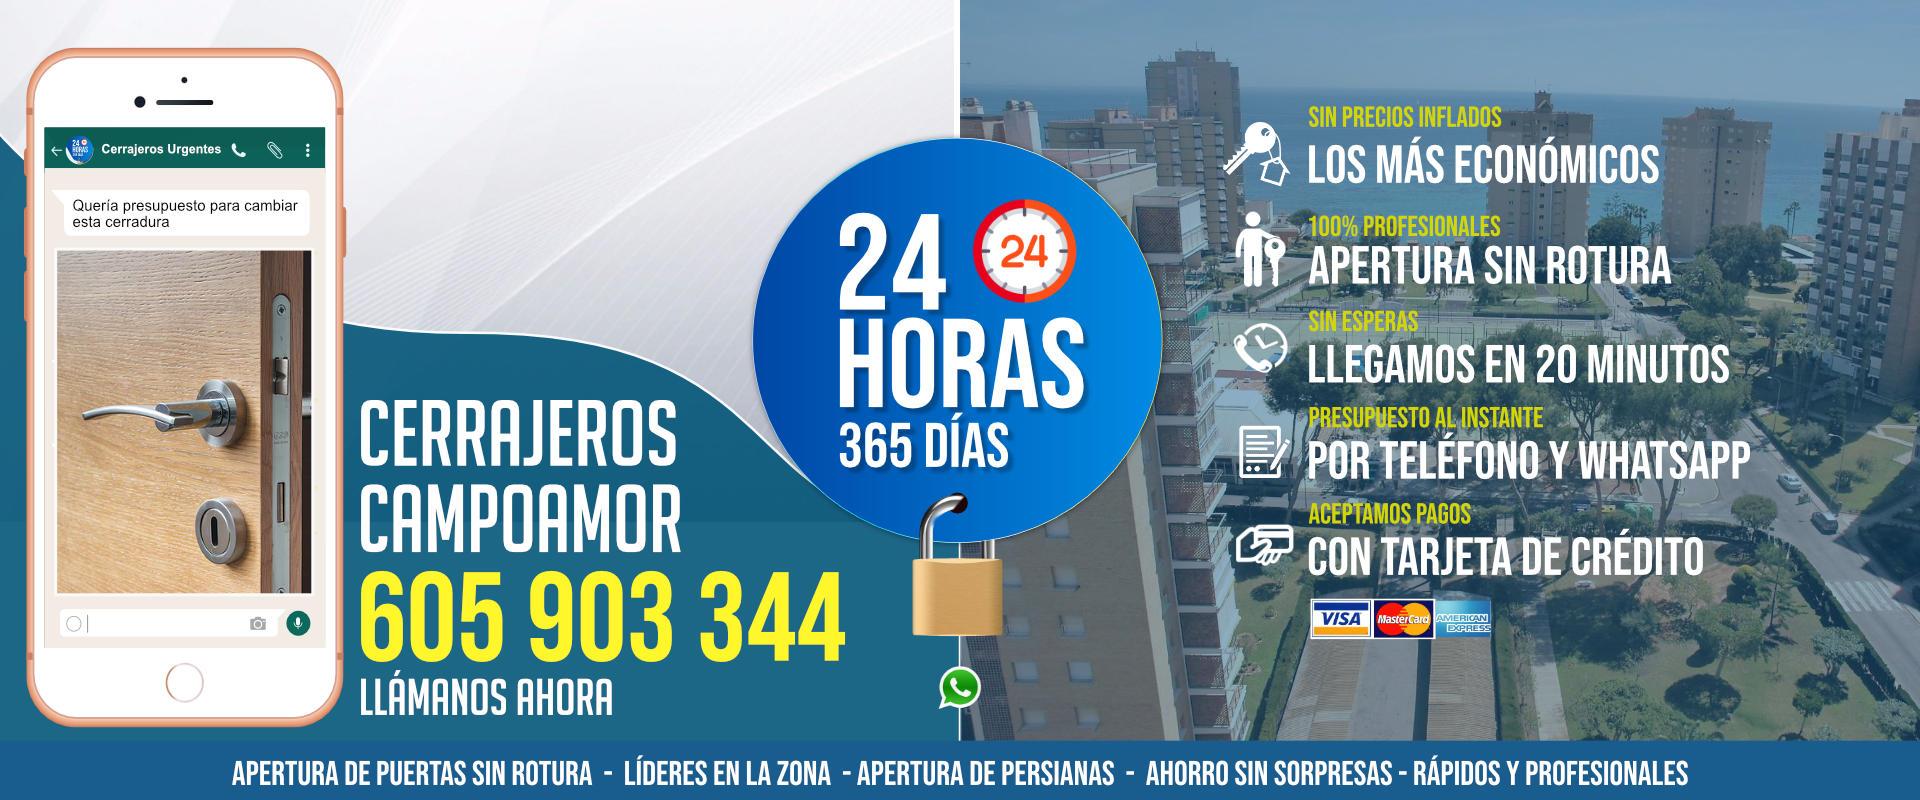 Cerrajeros Campoamor 1